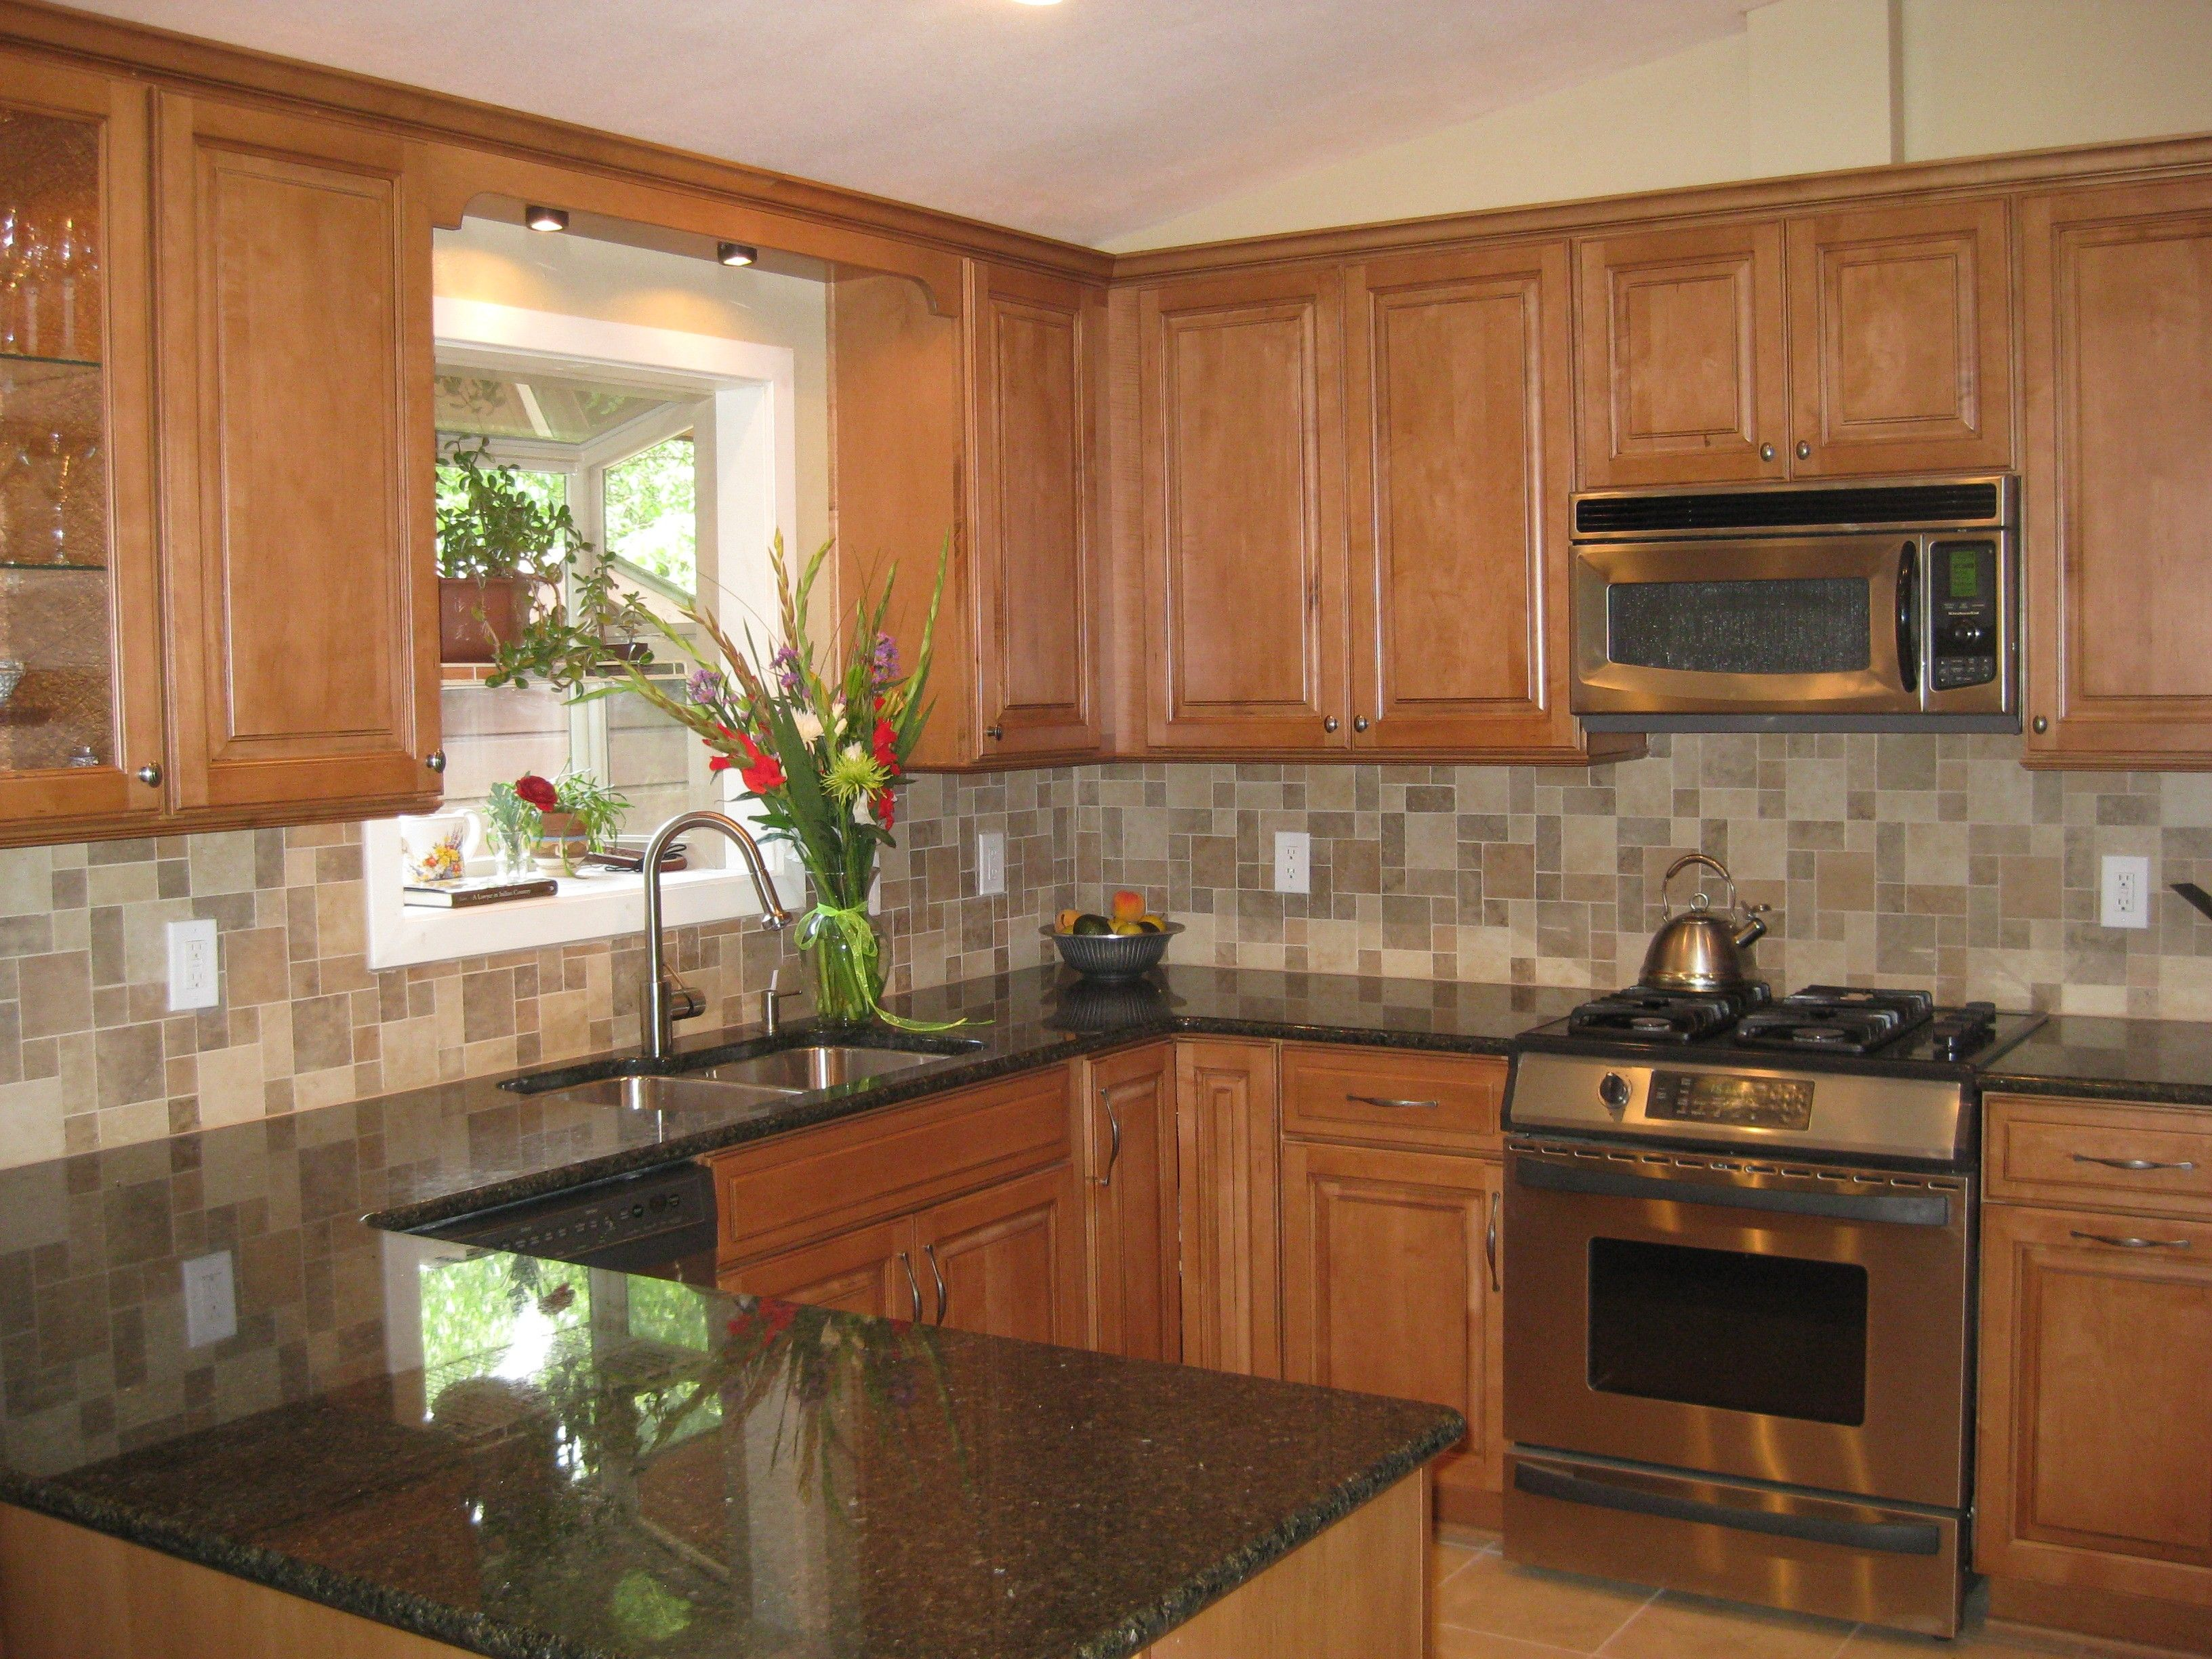 Kitchen Design Black Marble Countertops With Maple Cabinets Endearing Kitchen Design Granite Inspiration Design